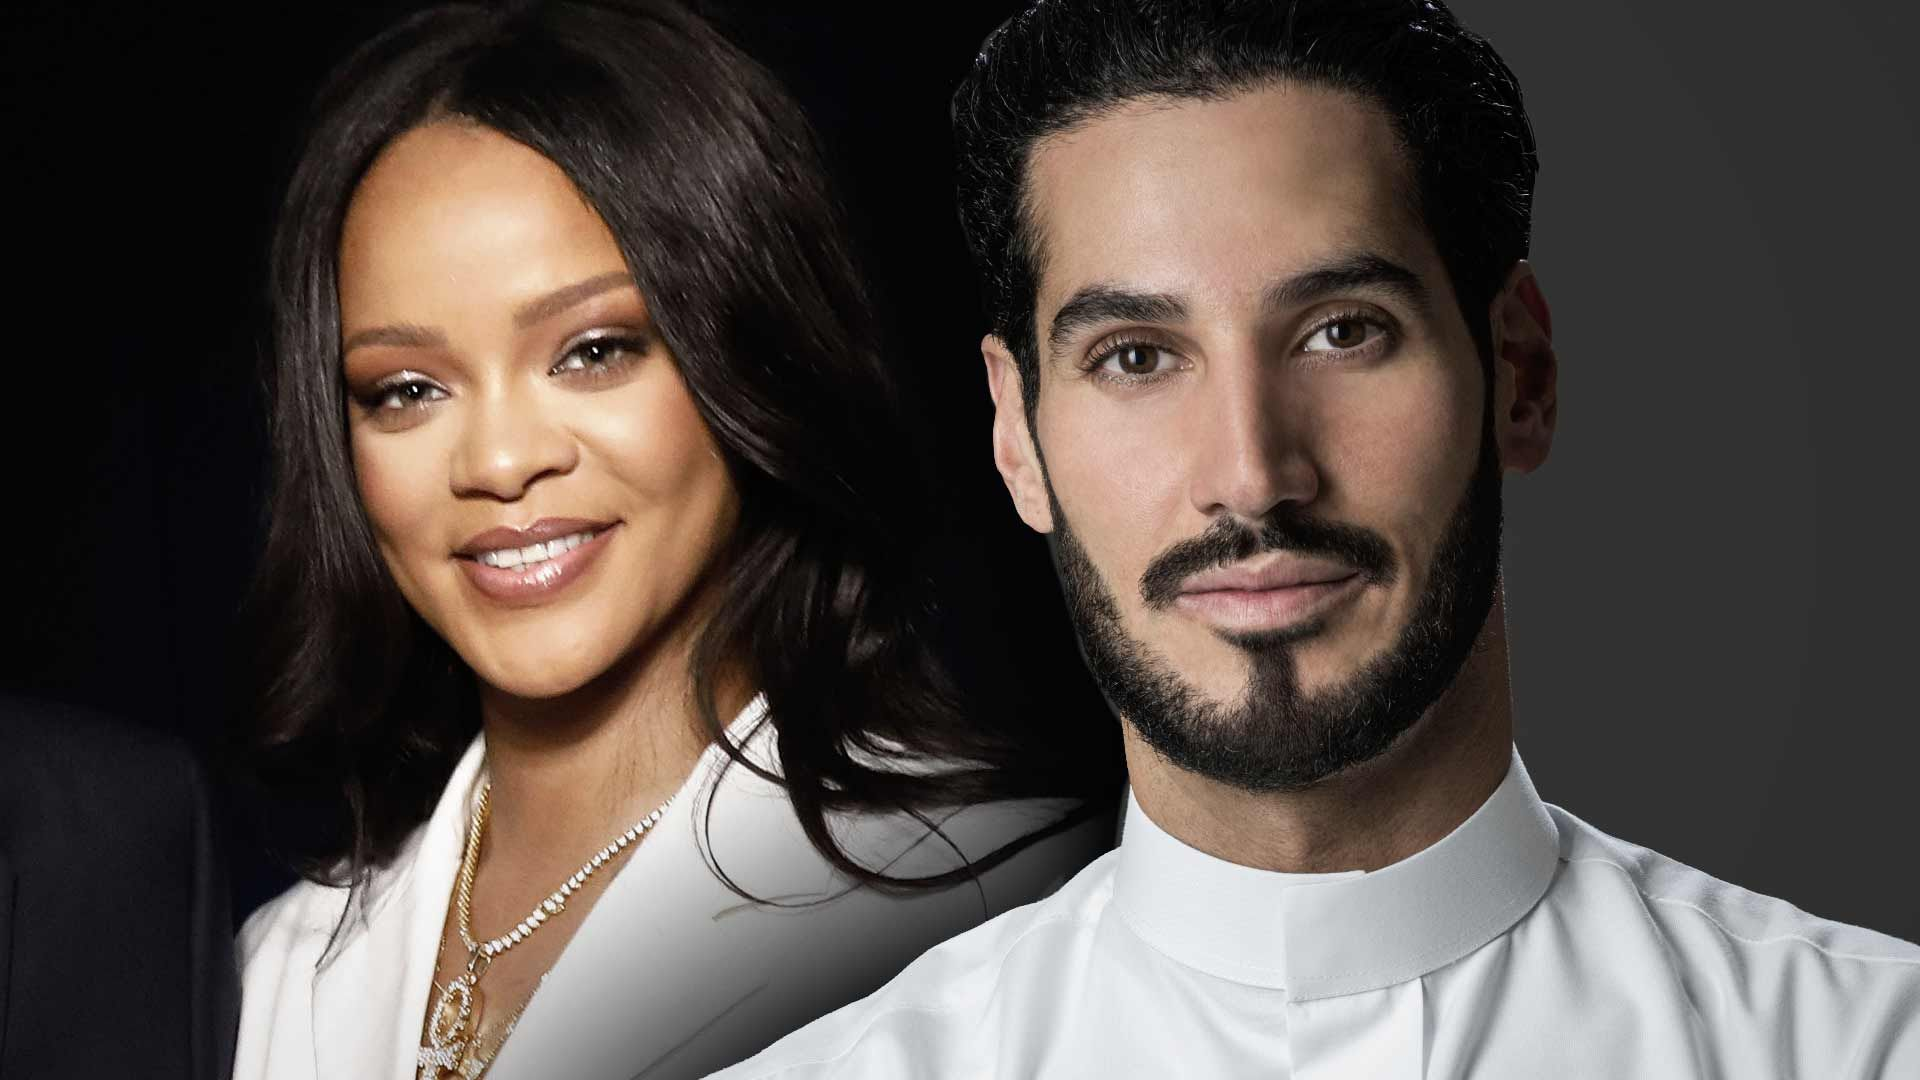 datos interesantes sobre Rihanna y hassan jameel 2019